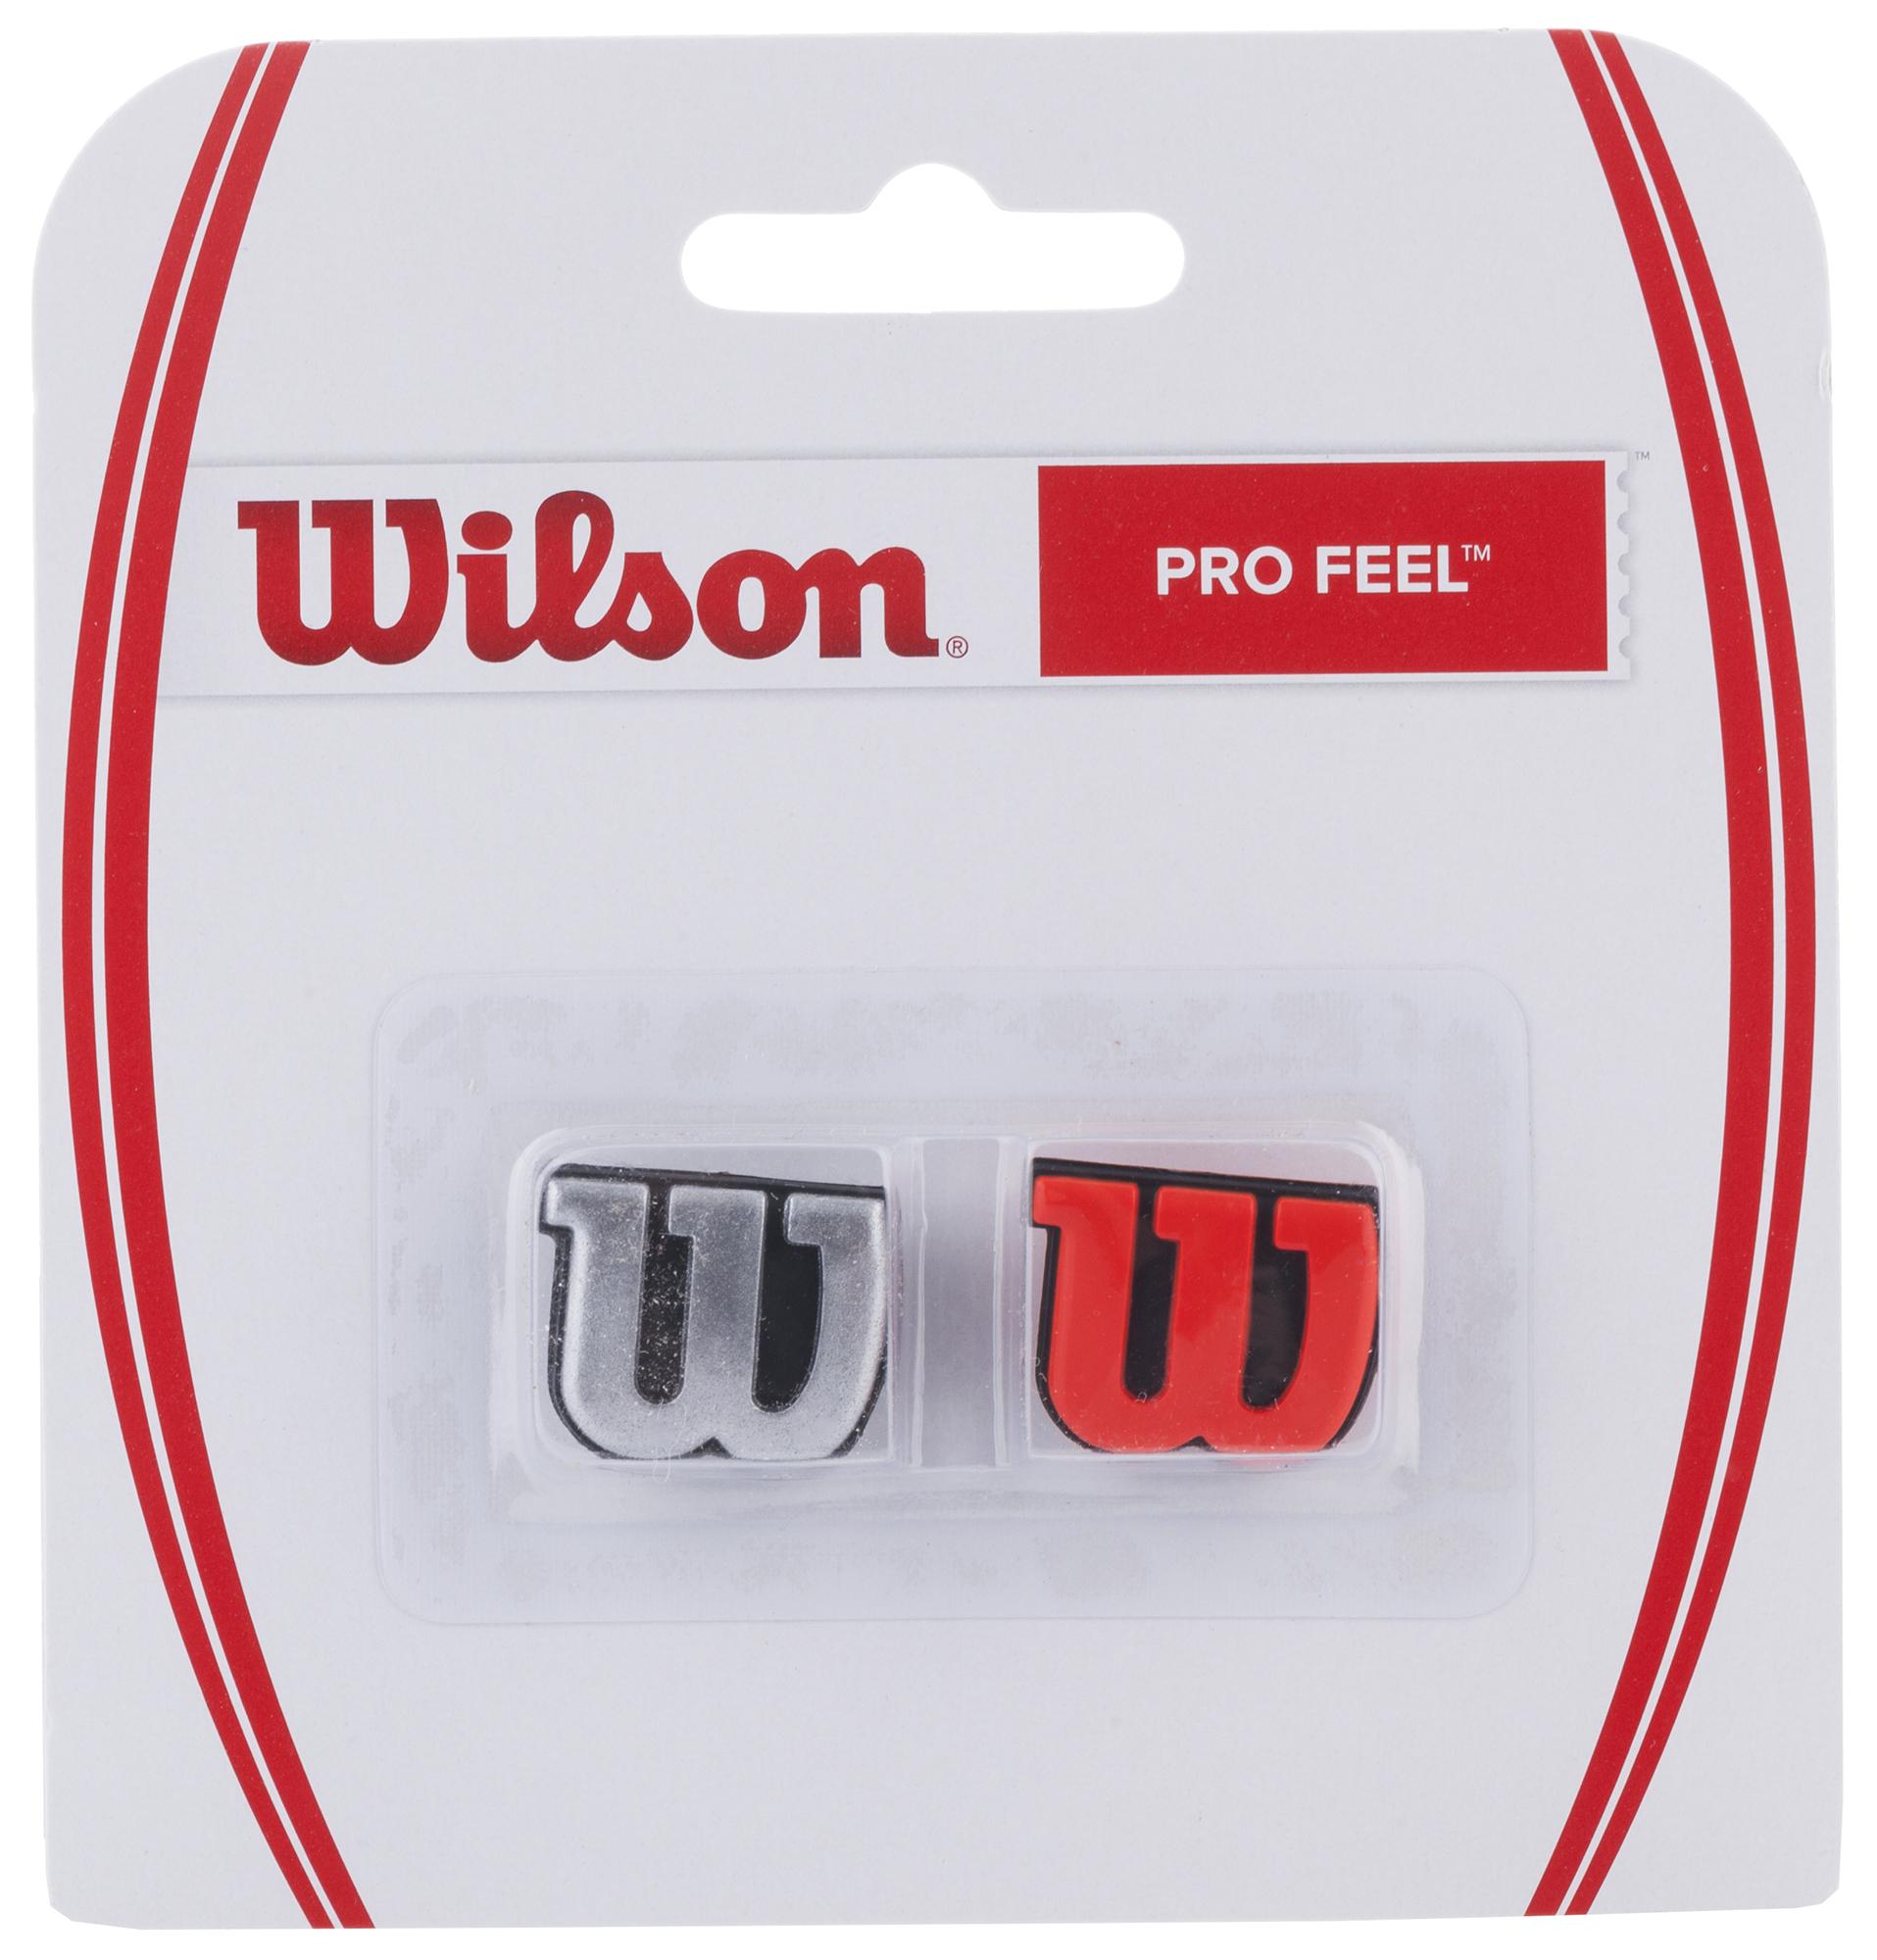 Wilson Виброгаситель Wilson Profeel RDSI цена